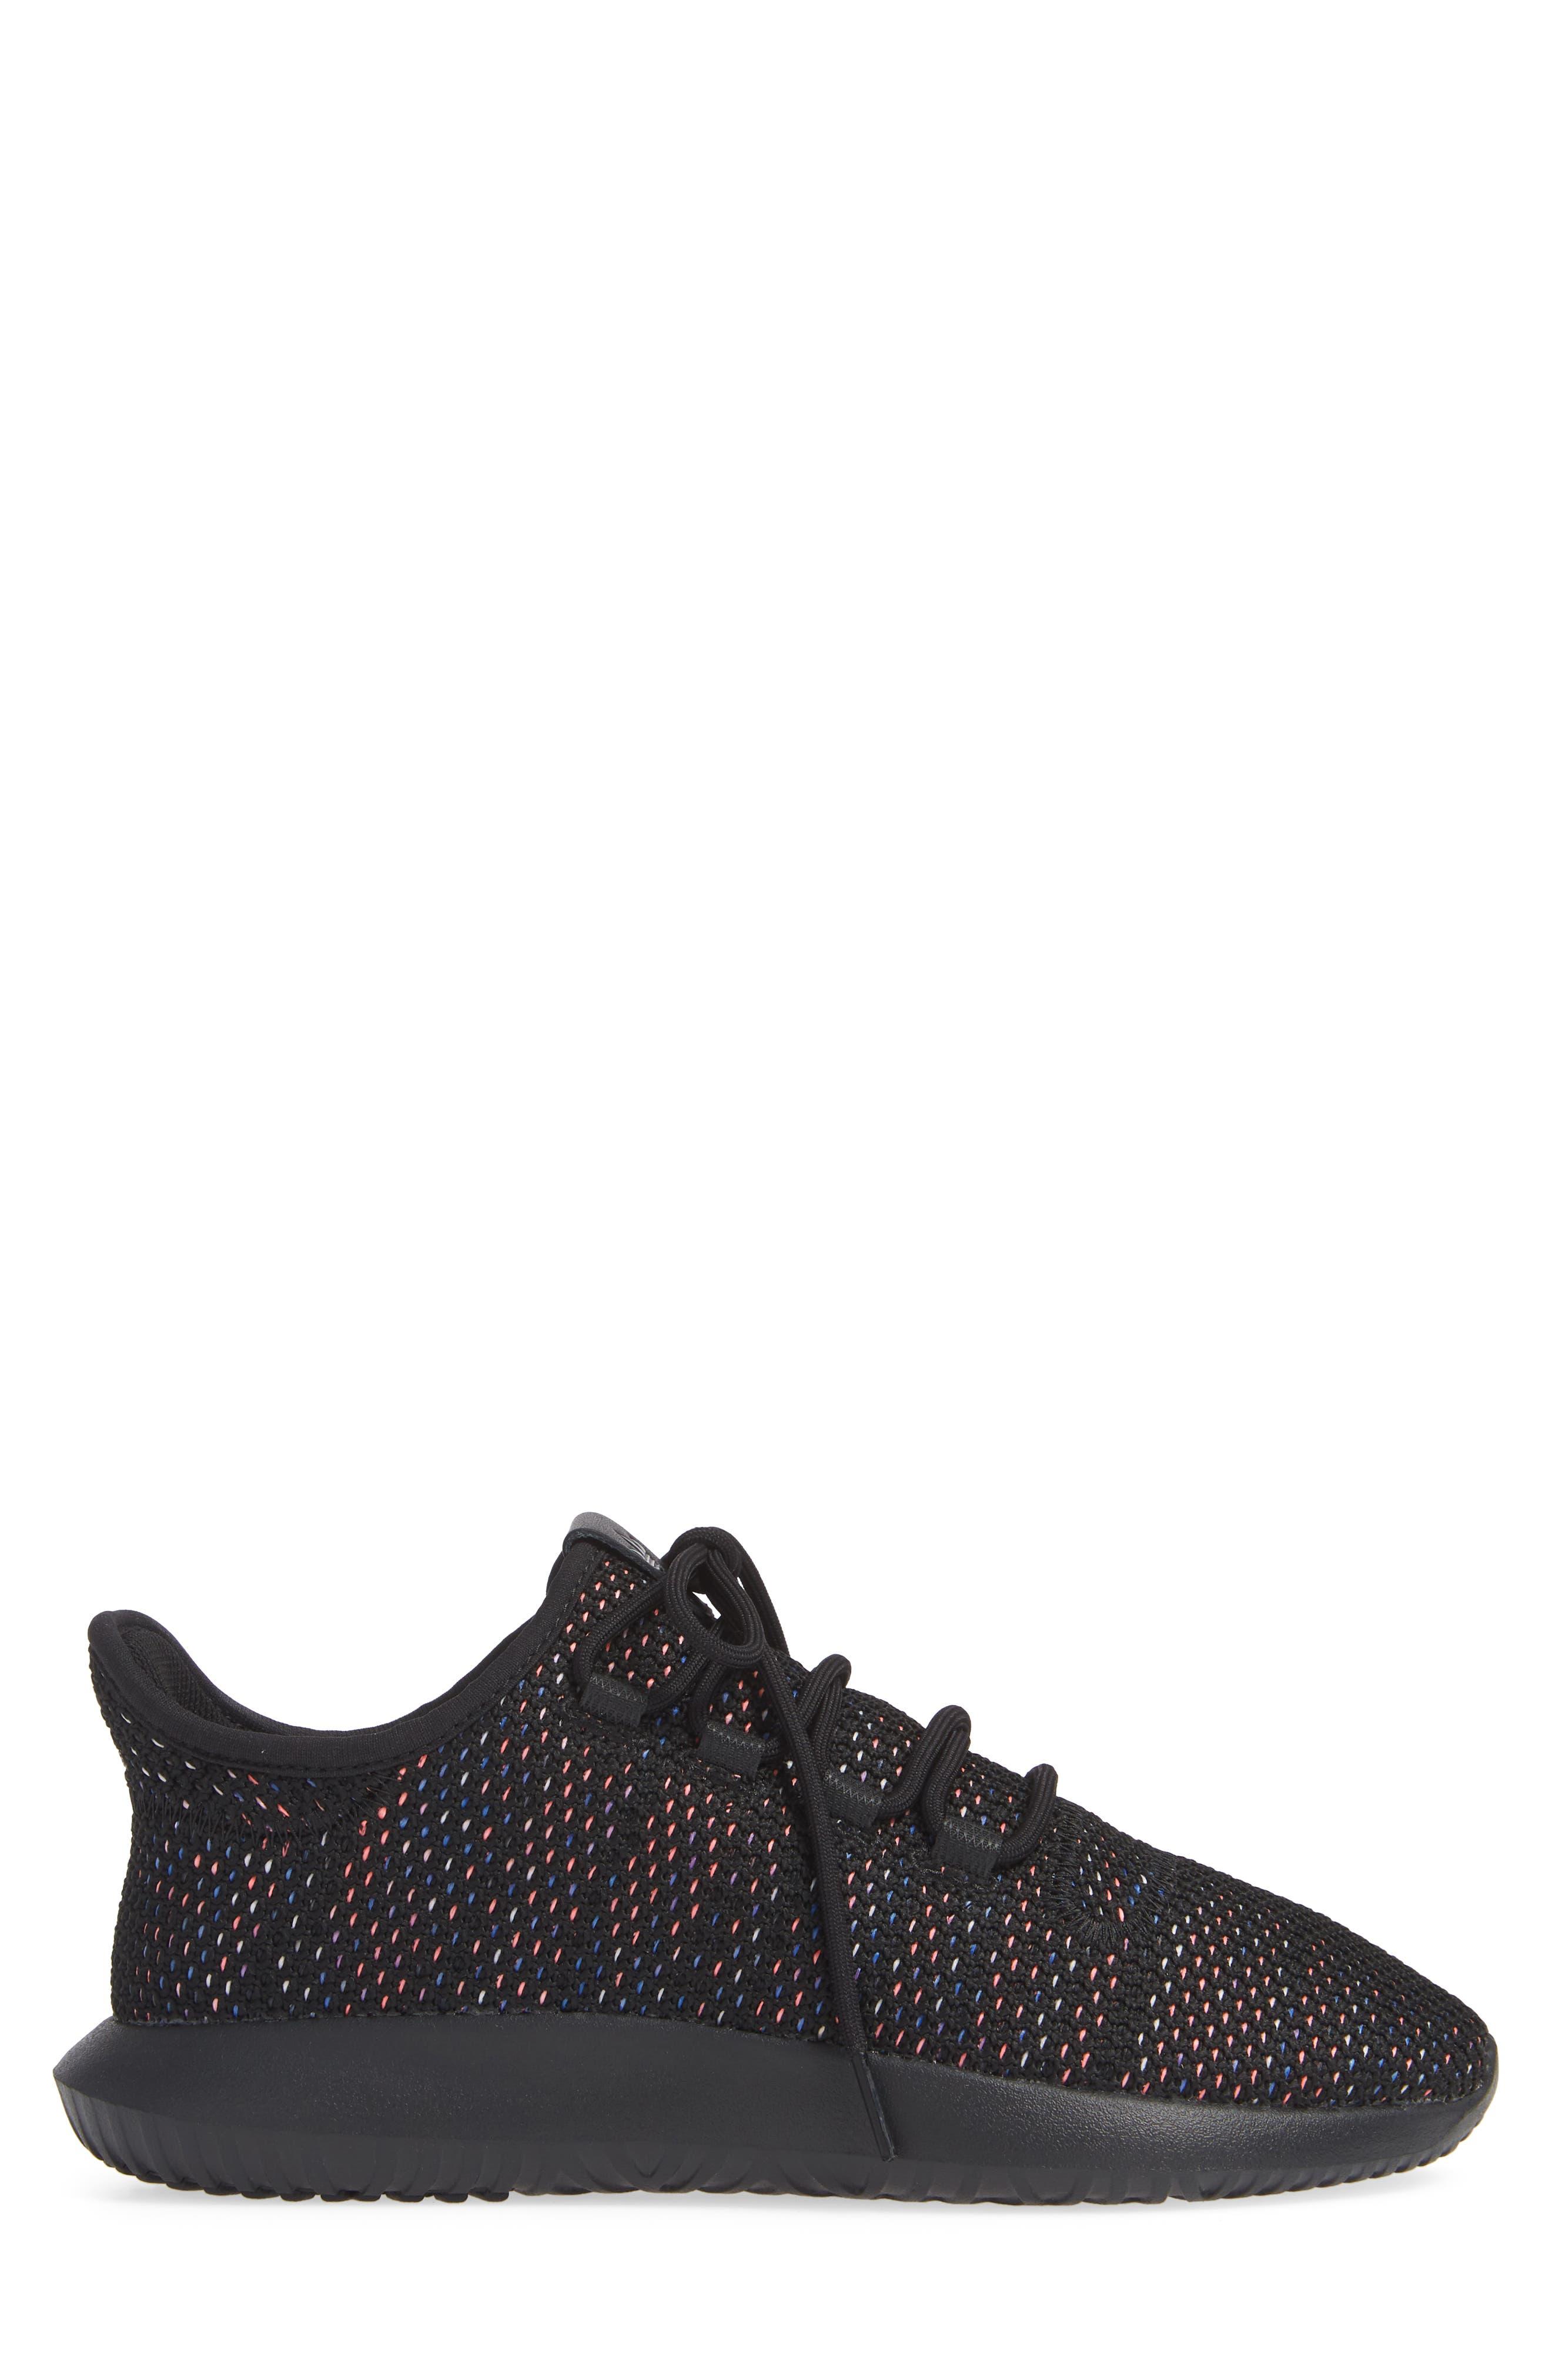 Tubular Shadow CK Sneaker,                             Alternate thumbnail 3, color,                             BLACK/ SOLAR RED/ MYSTERY INK